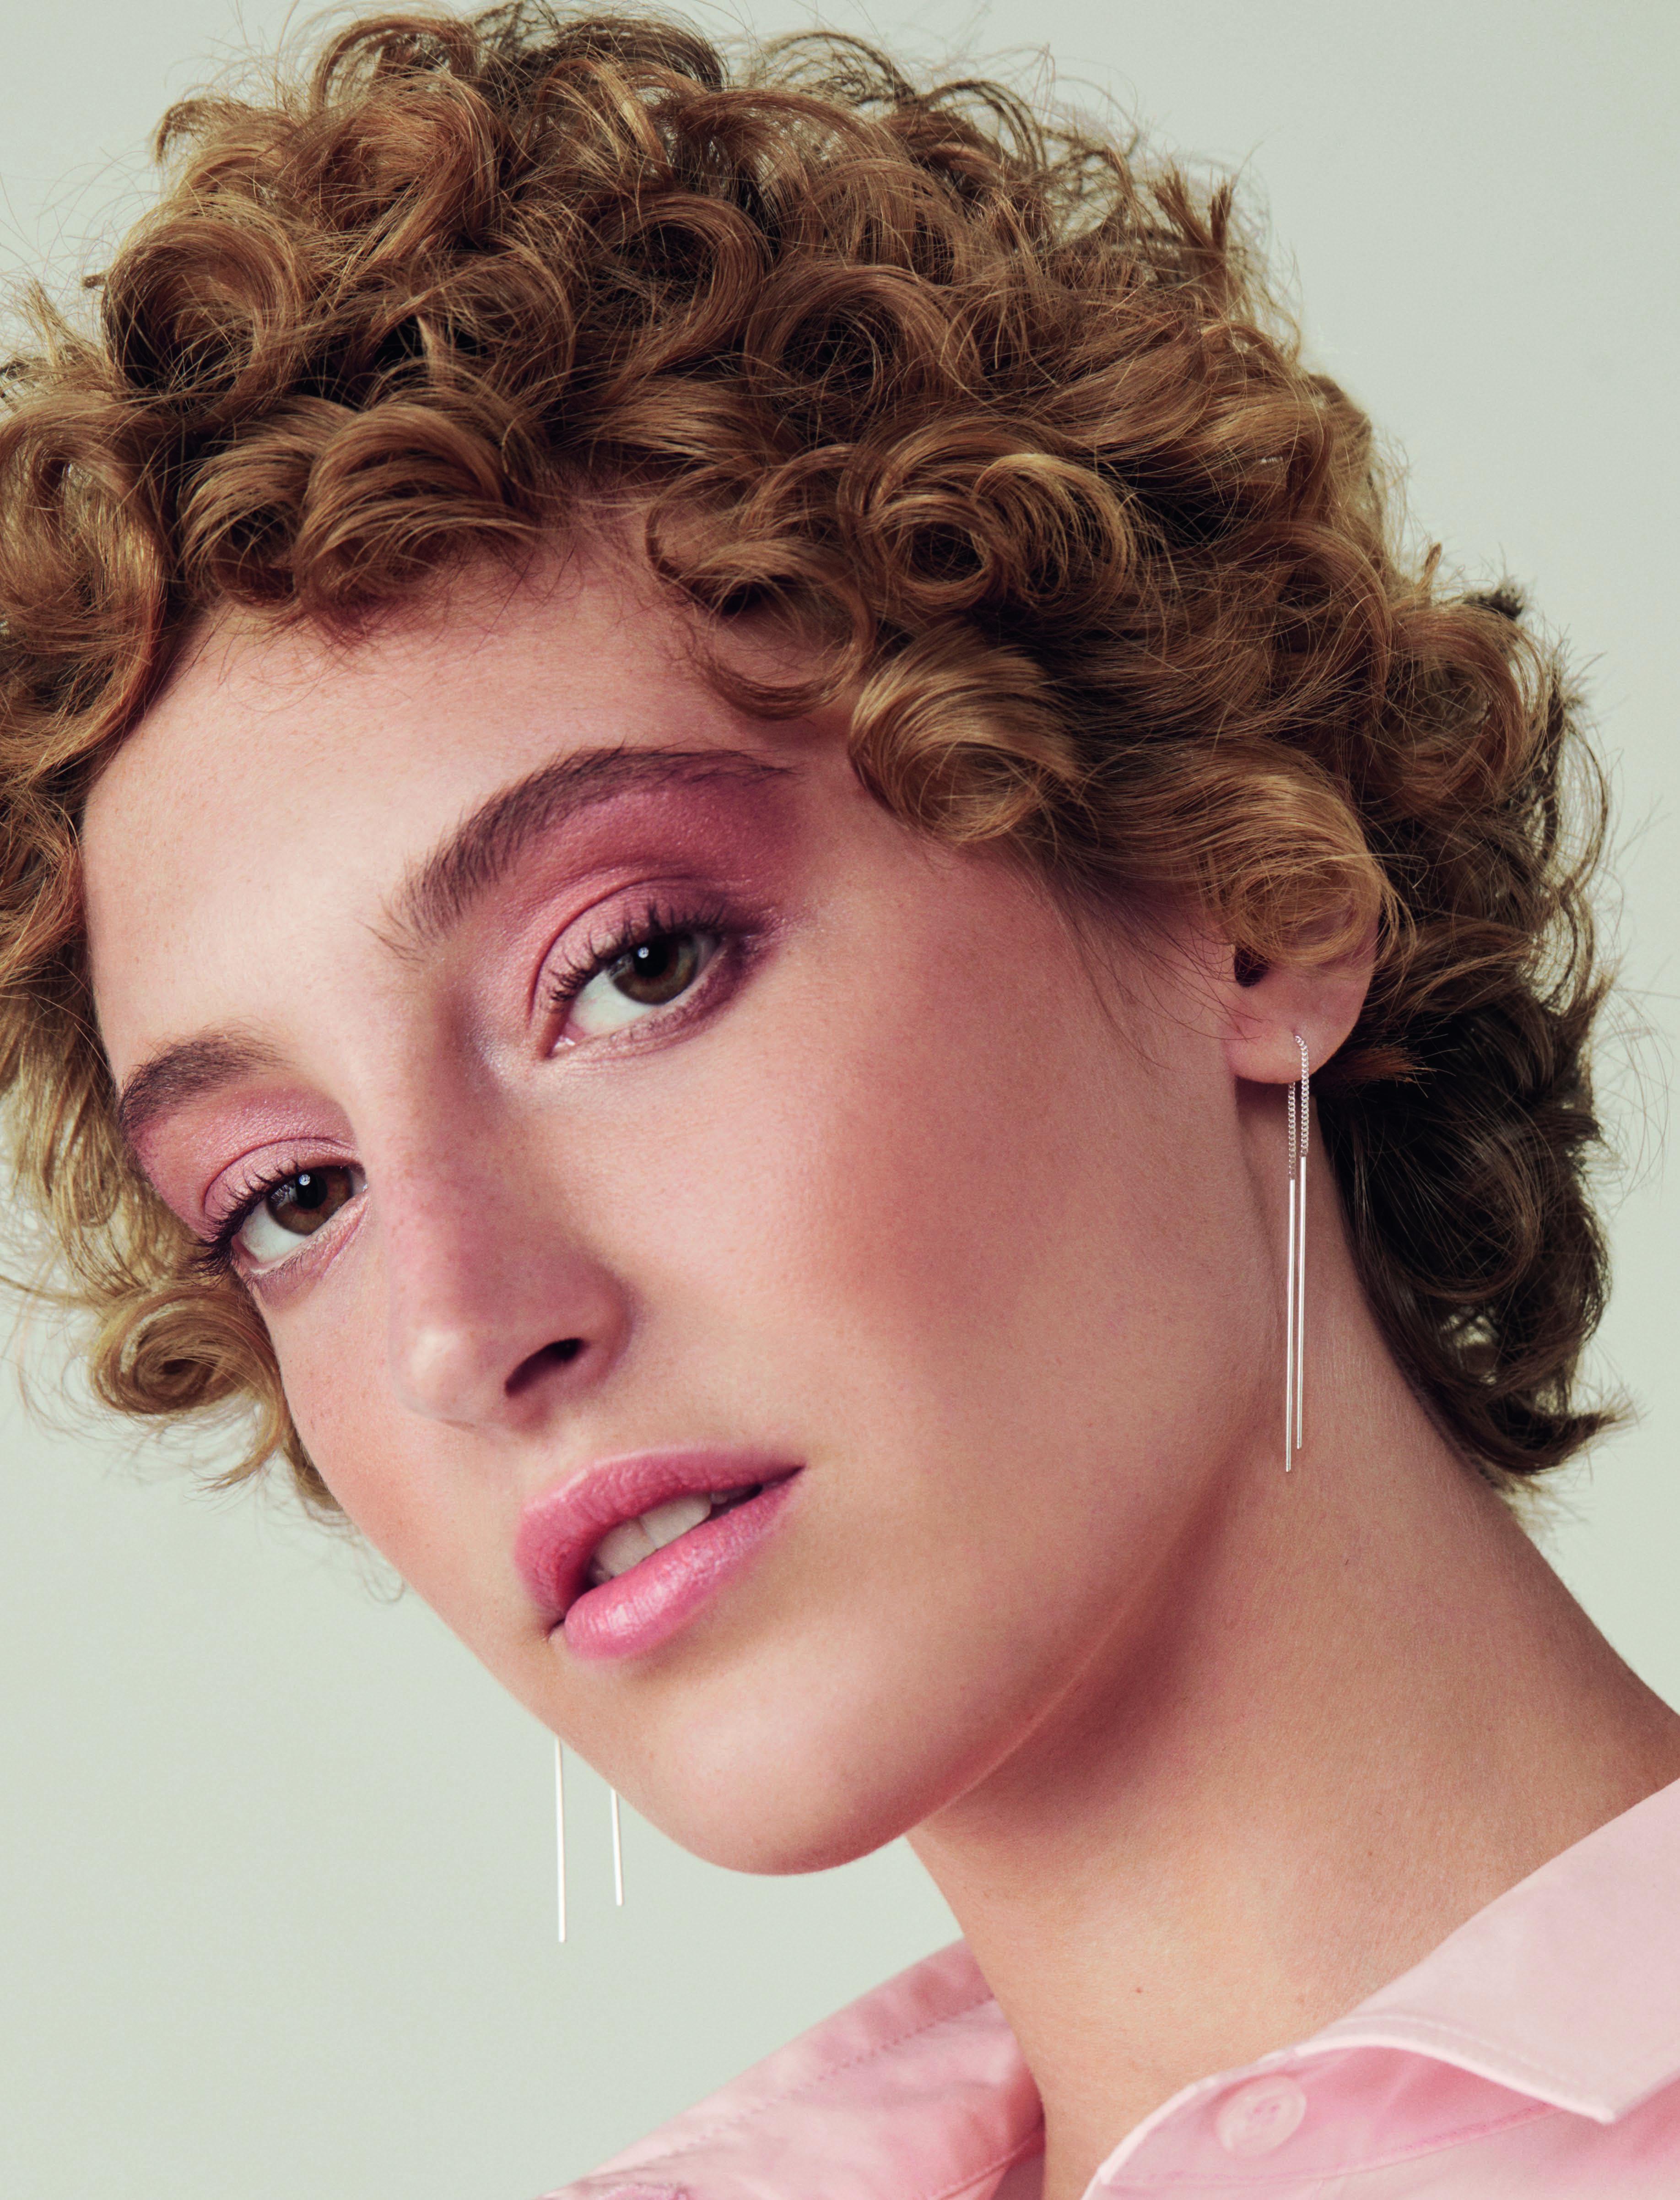 Hair Trends Spring Summer 2019 - Profiles Salon Redditch